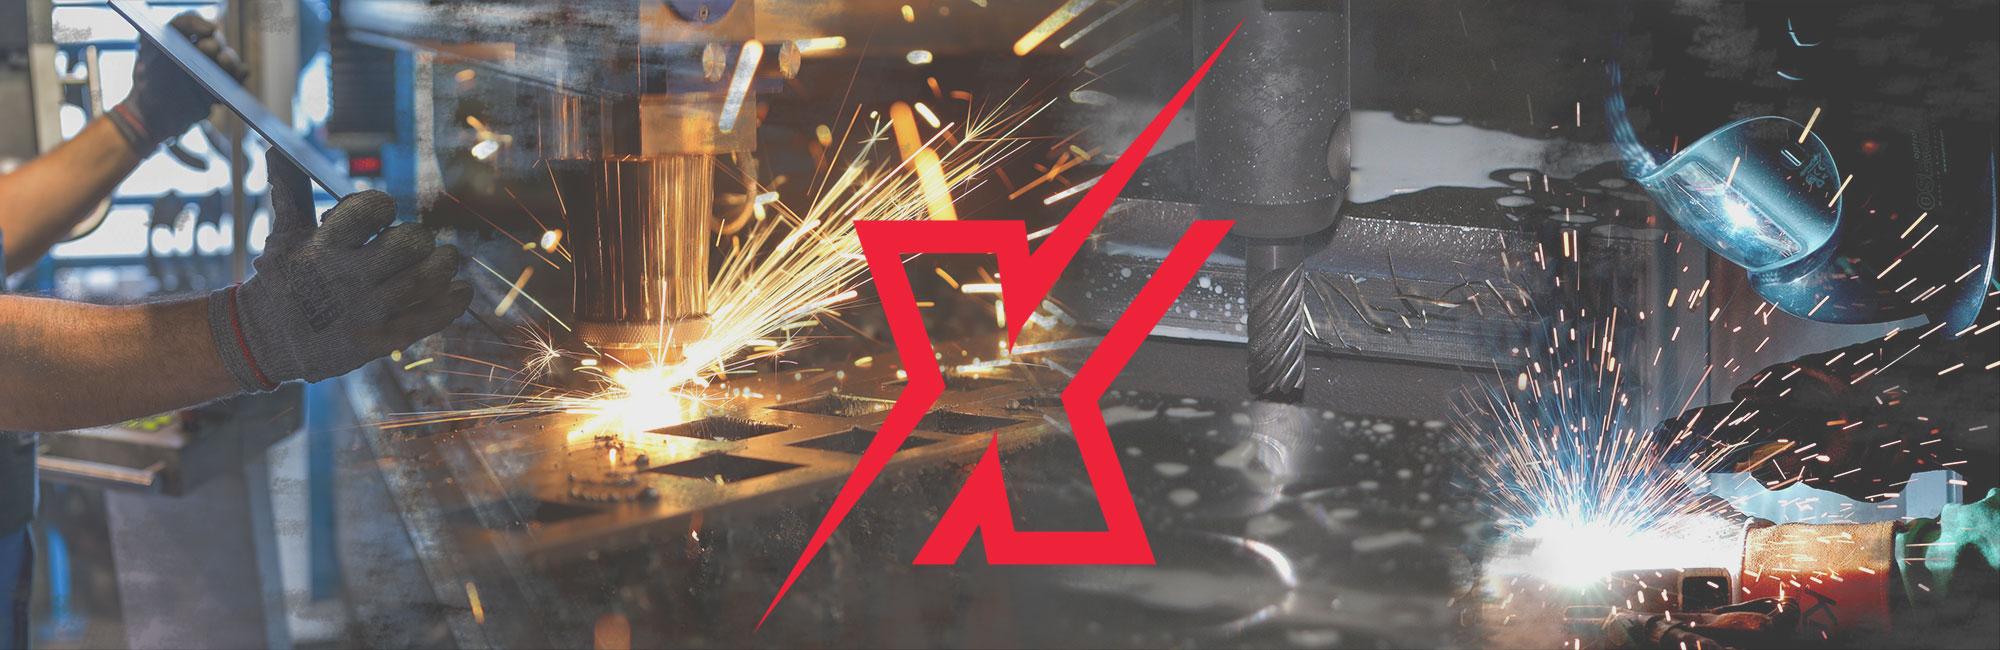 FabX Industries multiple images